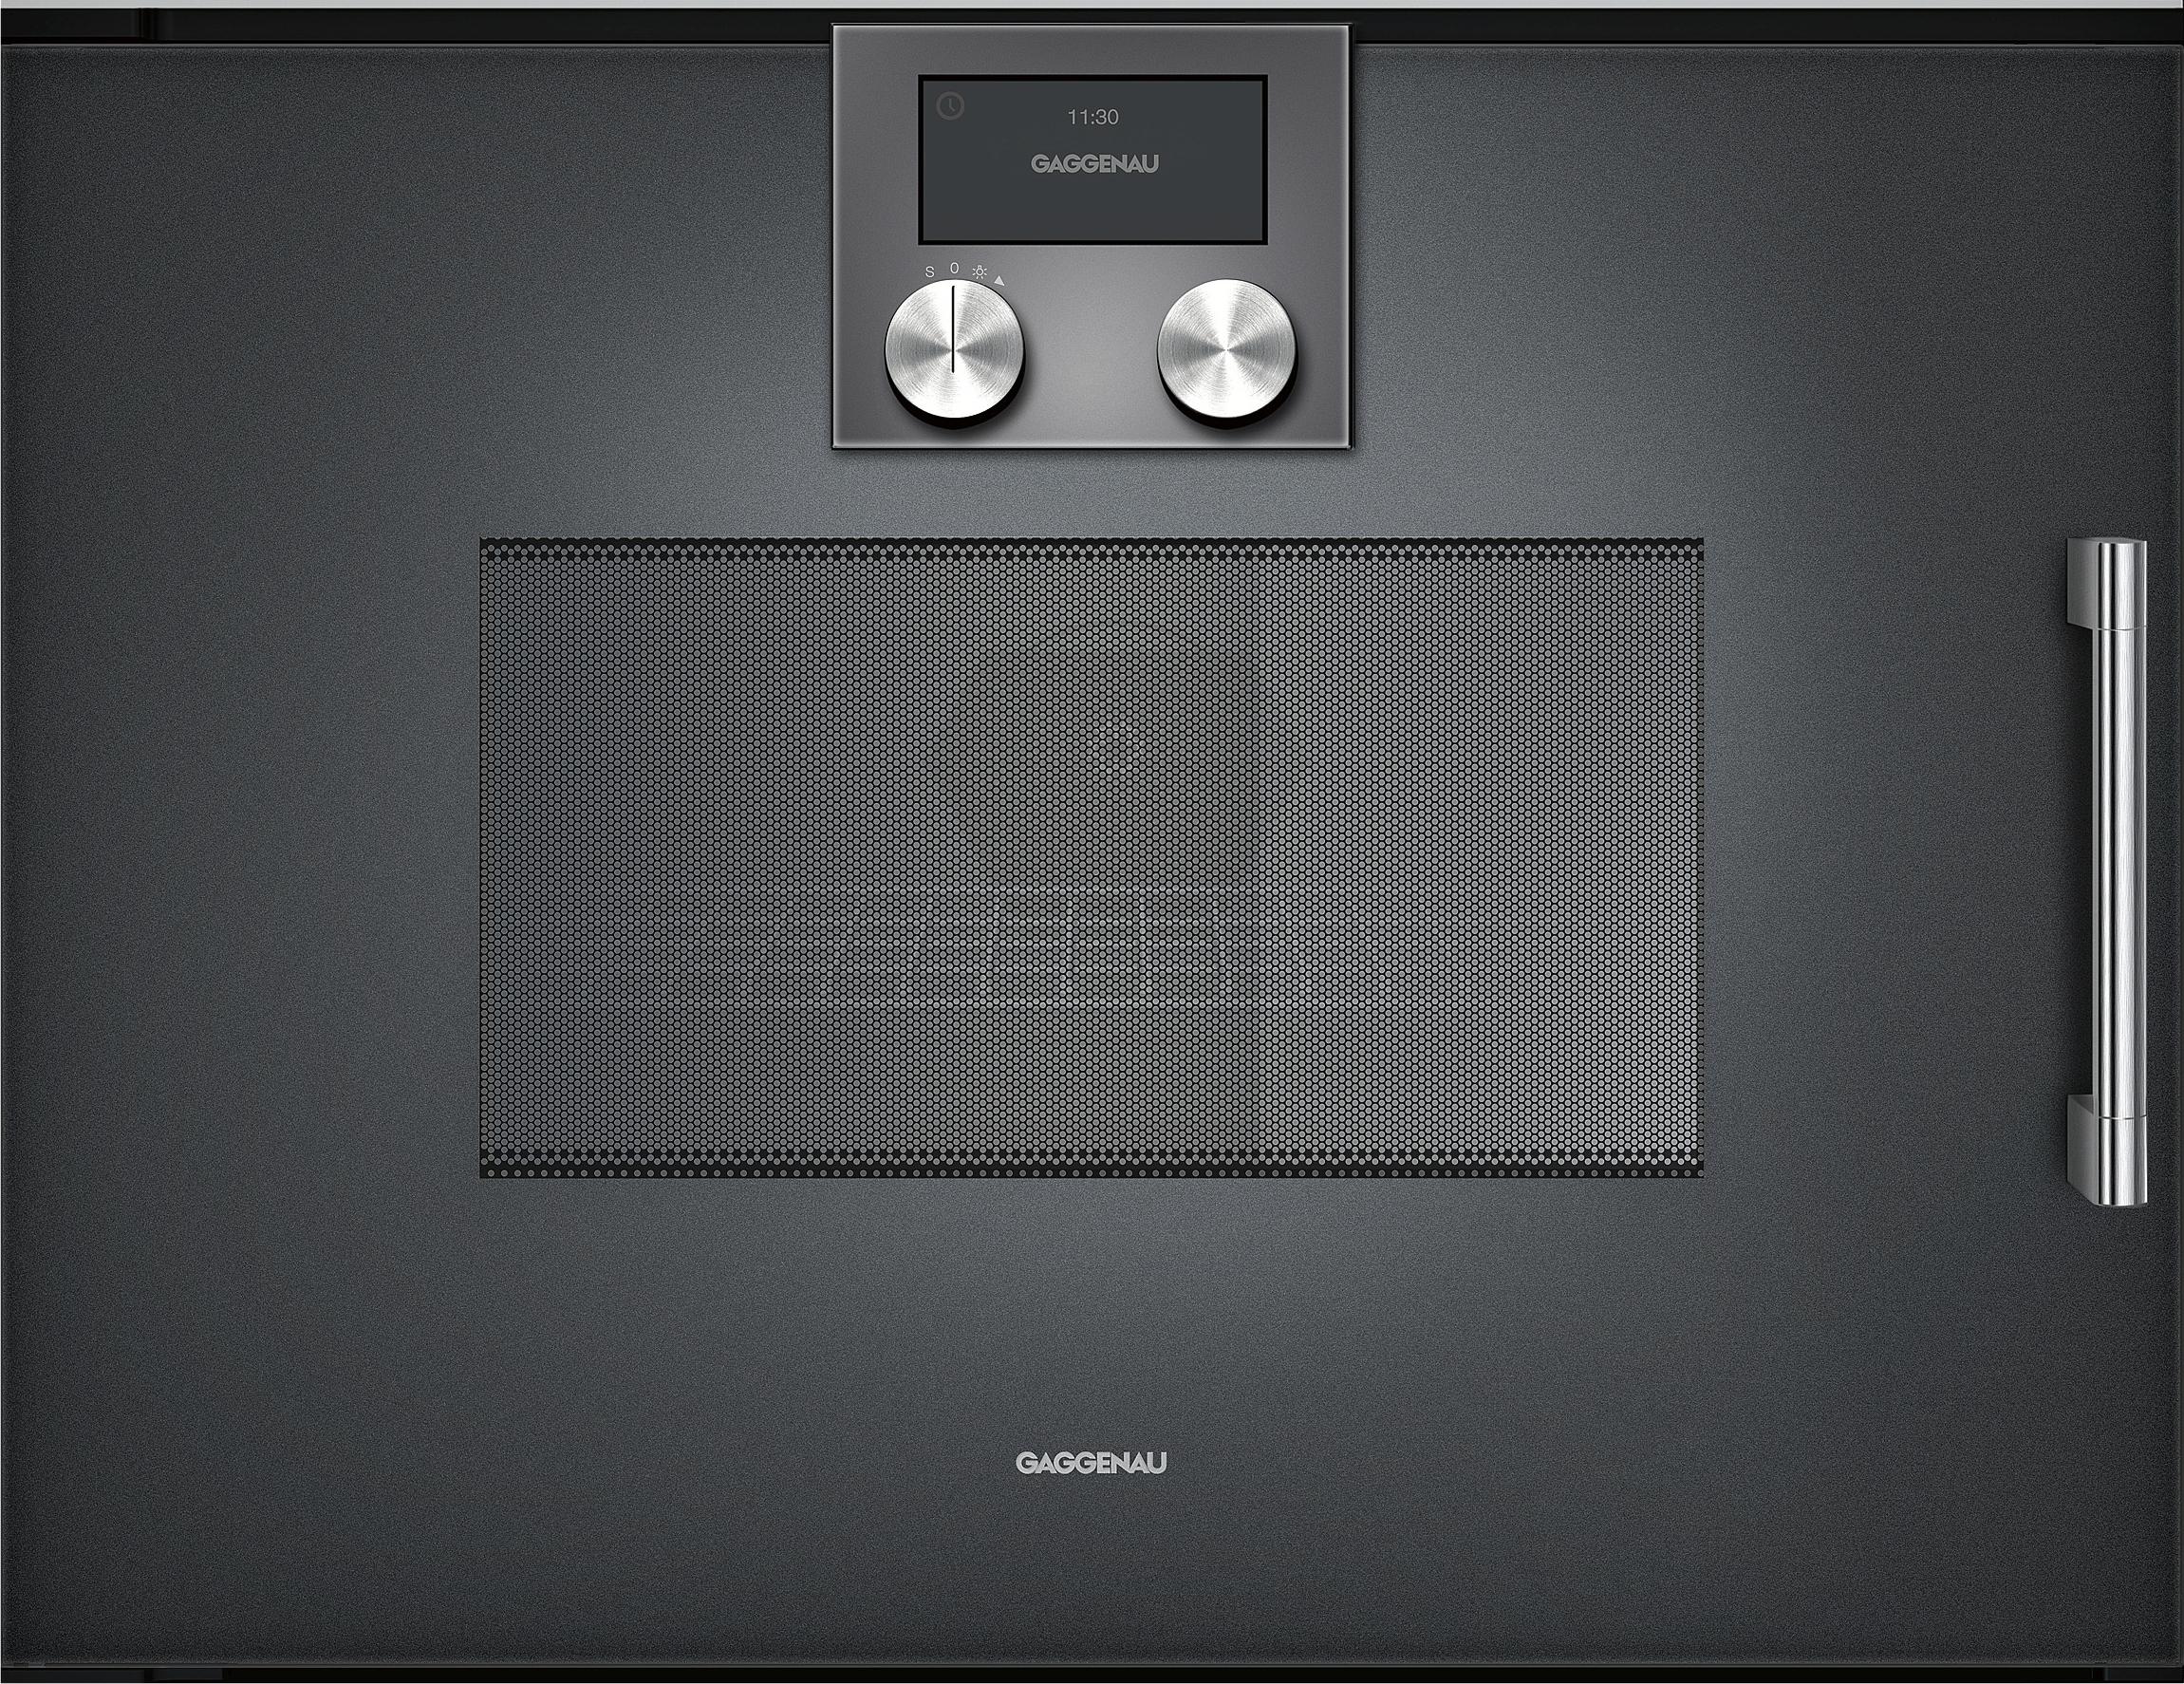 gaggenau bmp251100 mikrowellen backofen serie 200. Black Bedroom Furniture Sets. Home Design Ideas